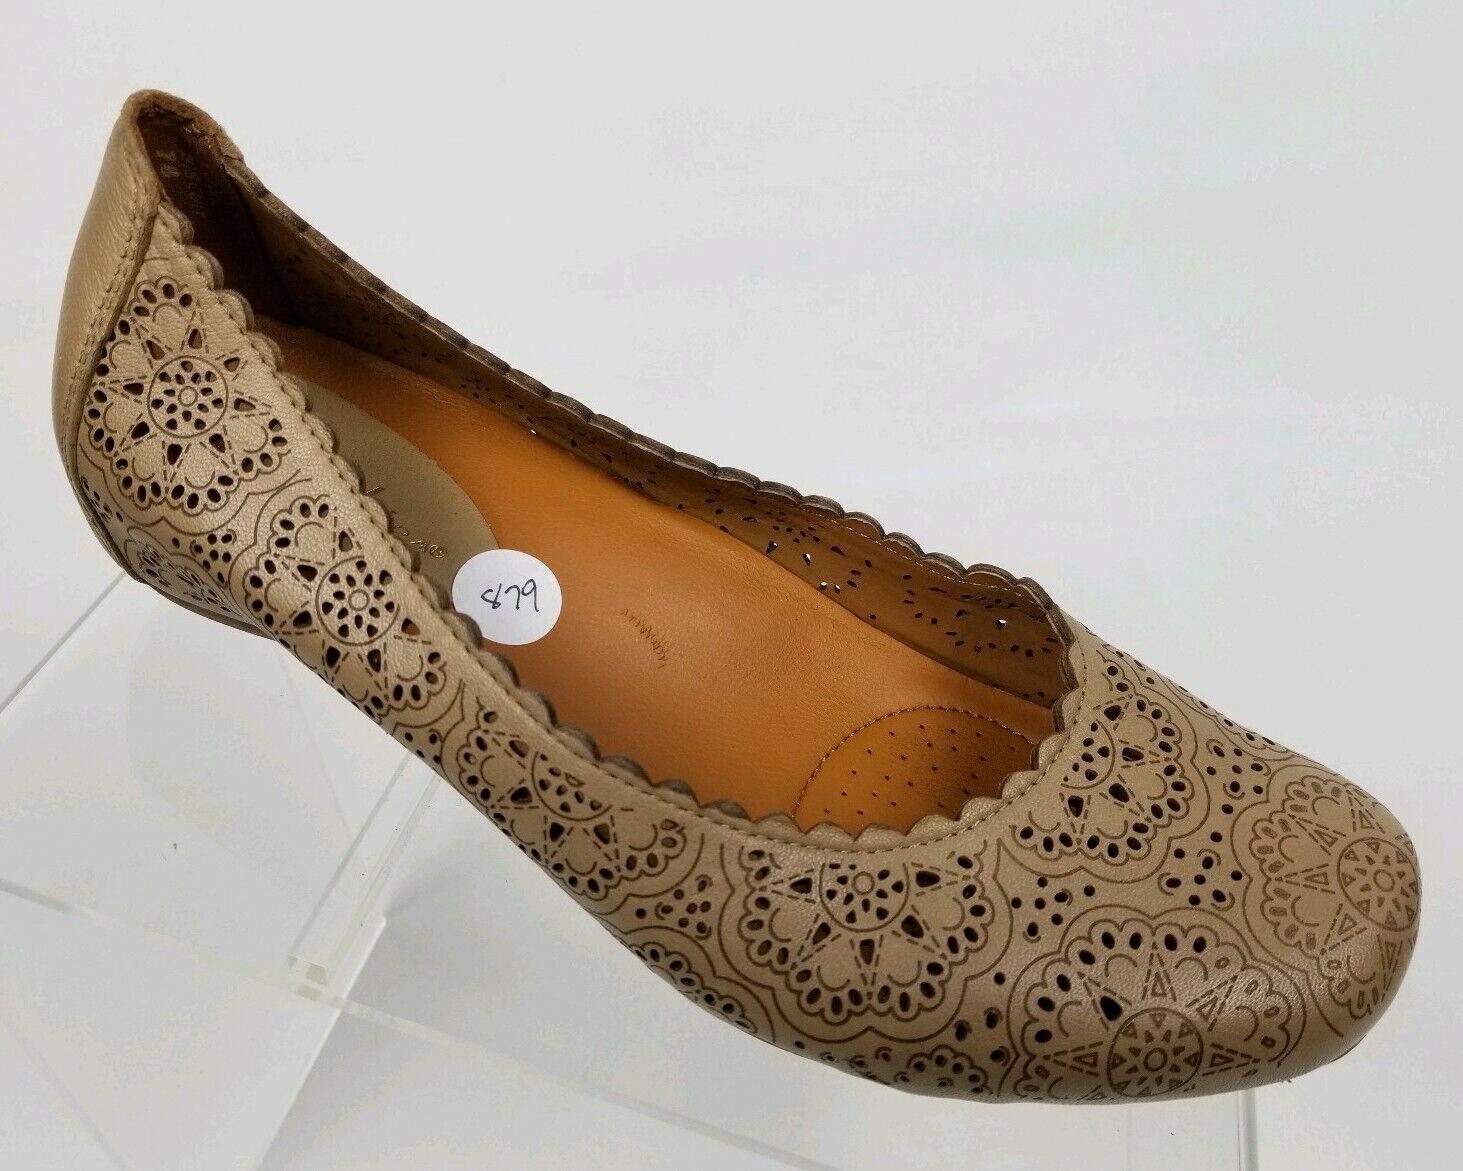 EARTHIES Bindi Women's Ballet Flats Nude Leather Cutouts Slip On shoes Sz 7B